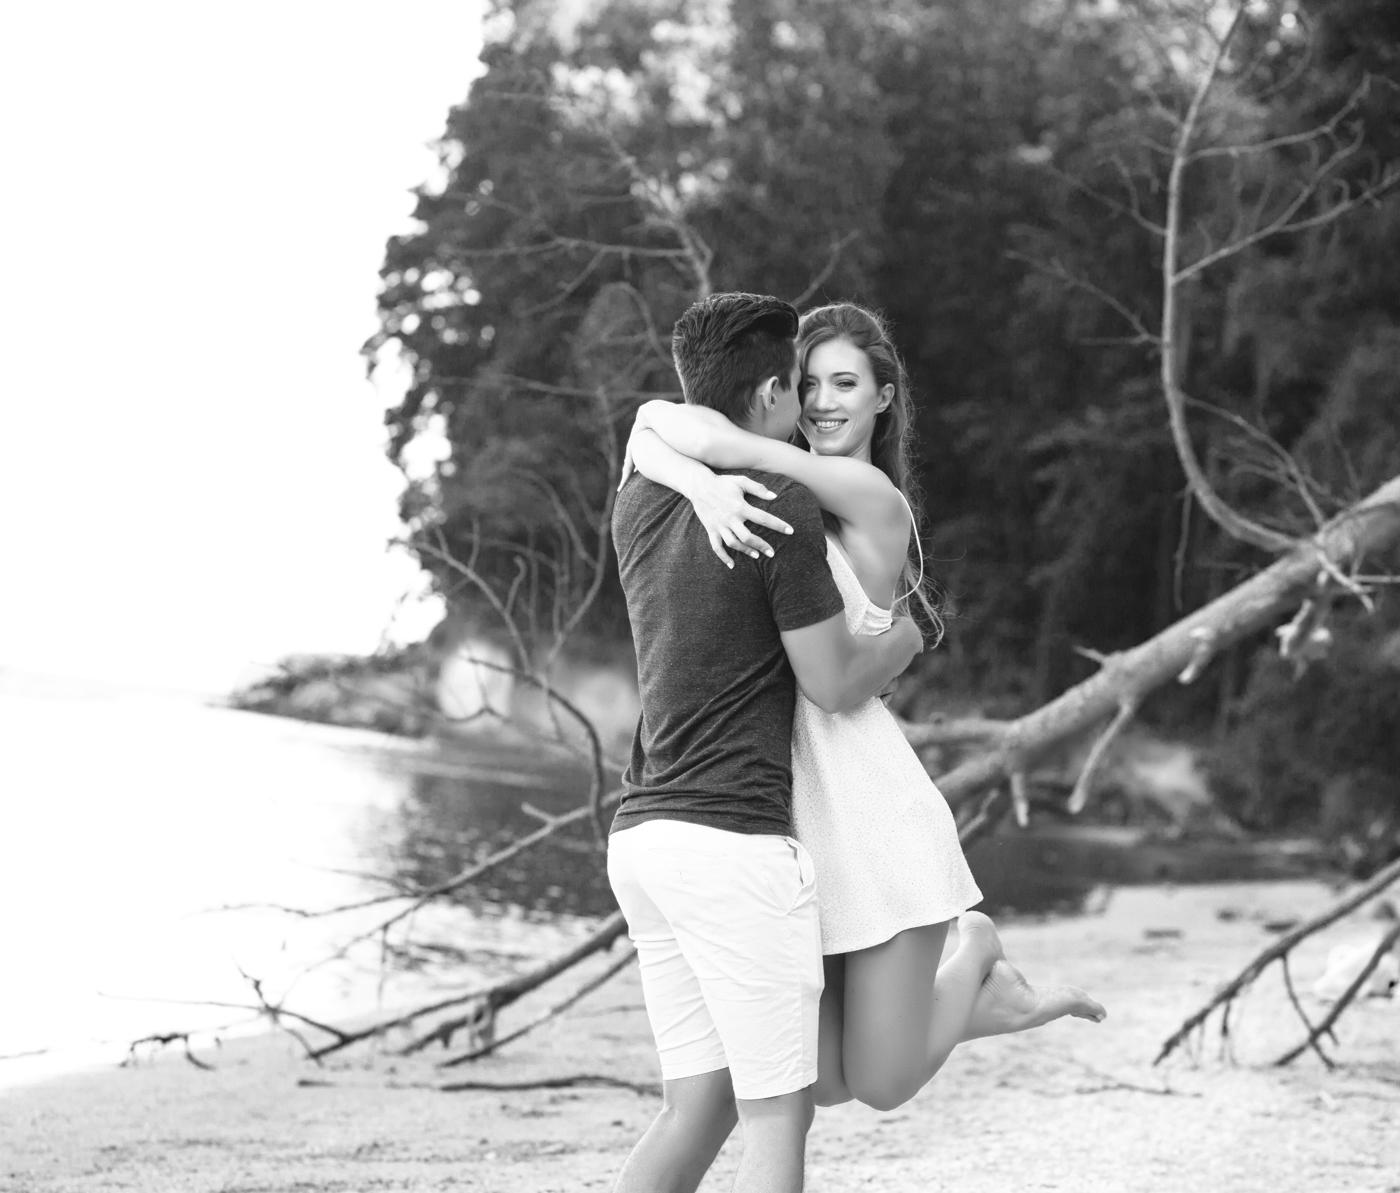 summer-beach-engagement-shoot-ksenia-pro-photography-55